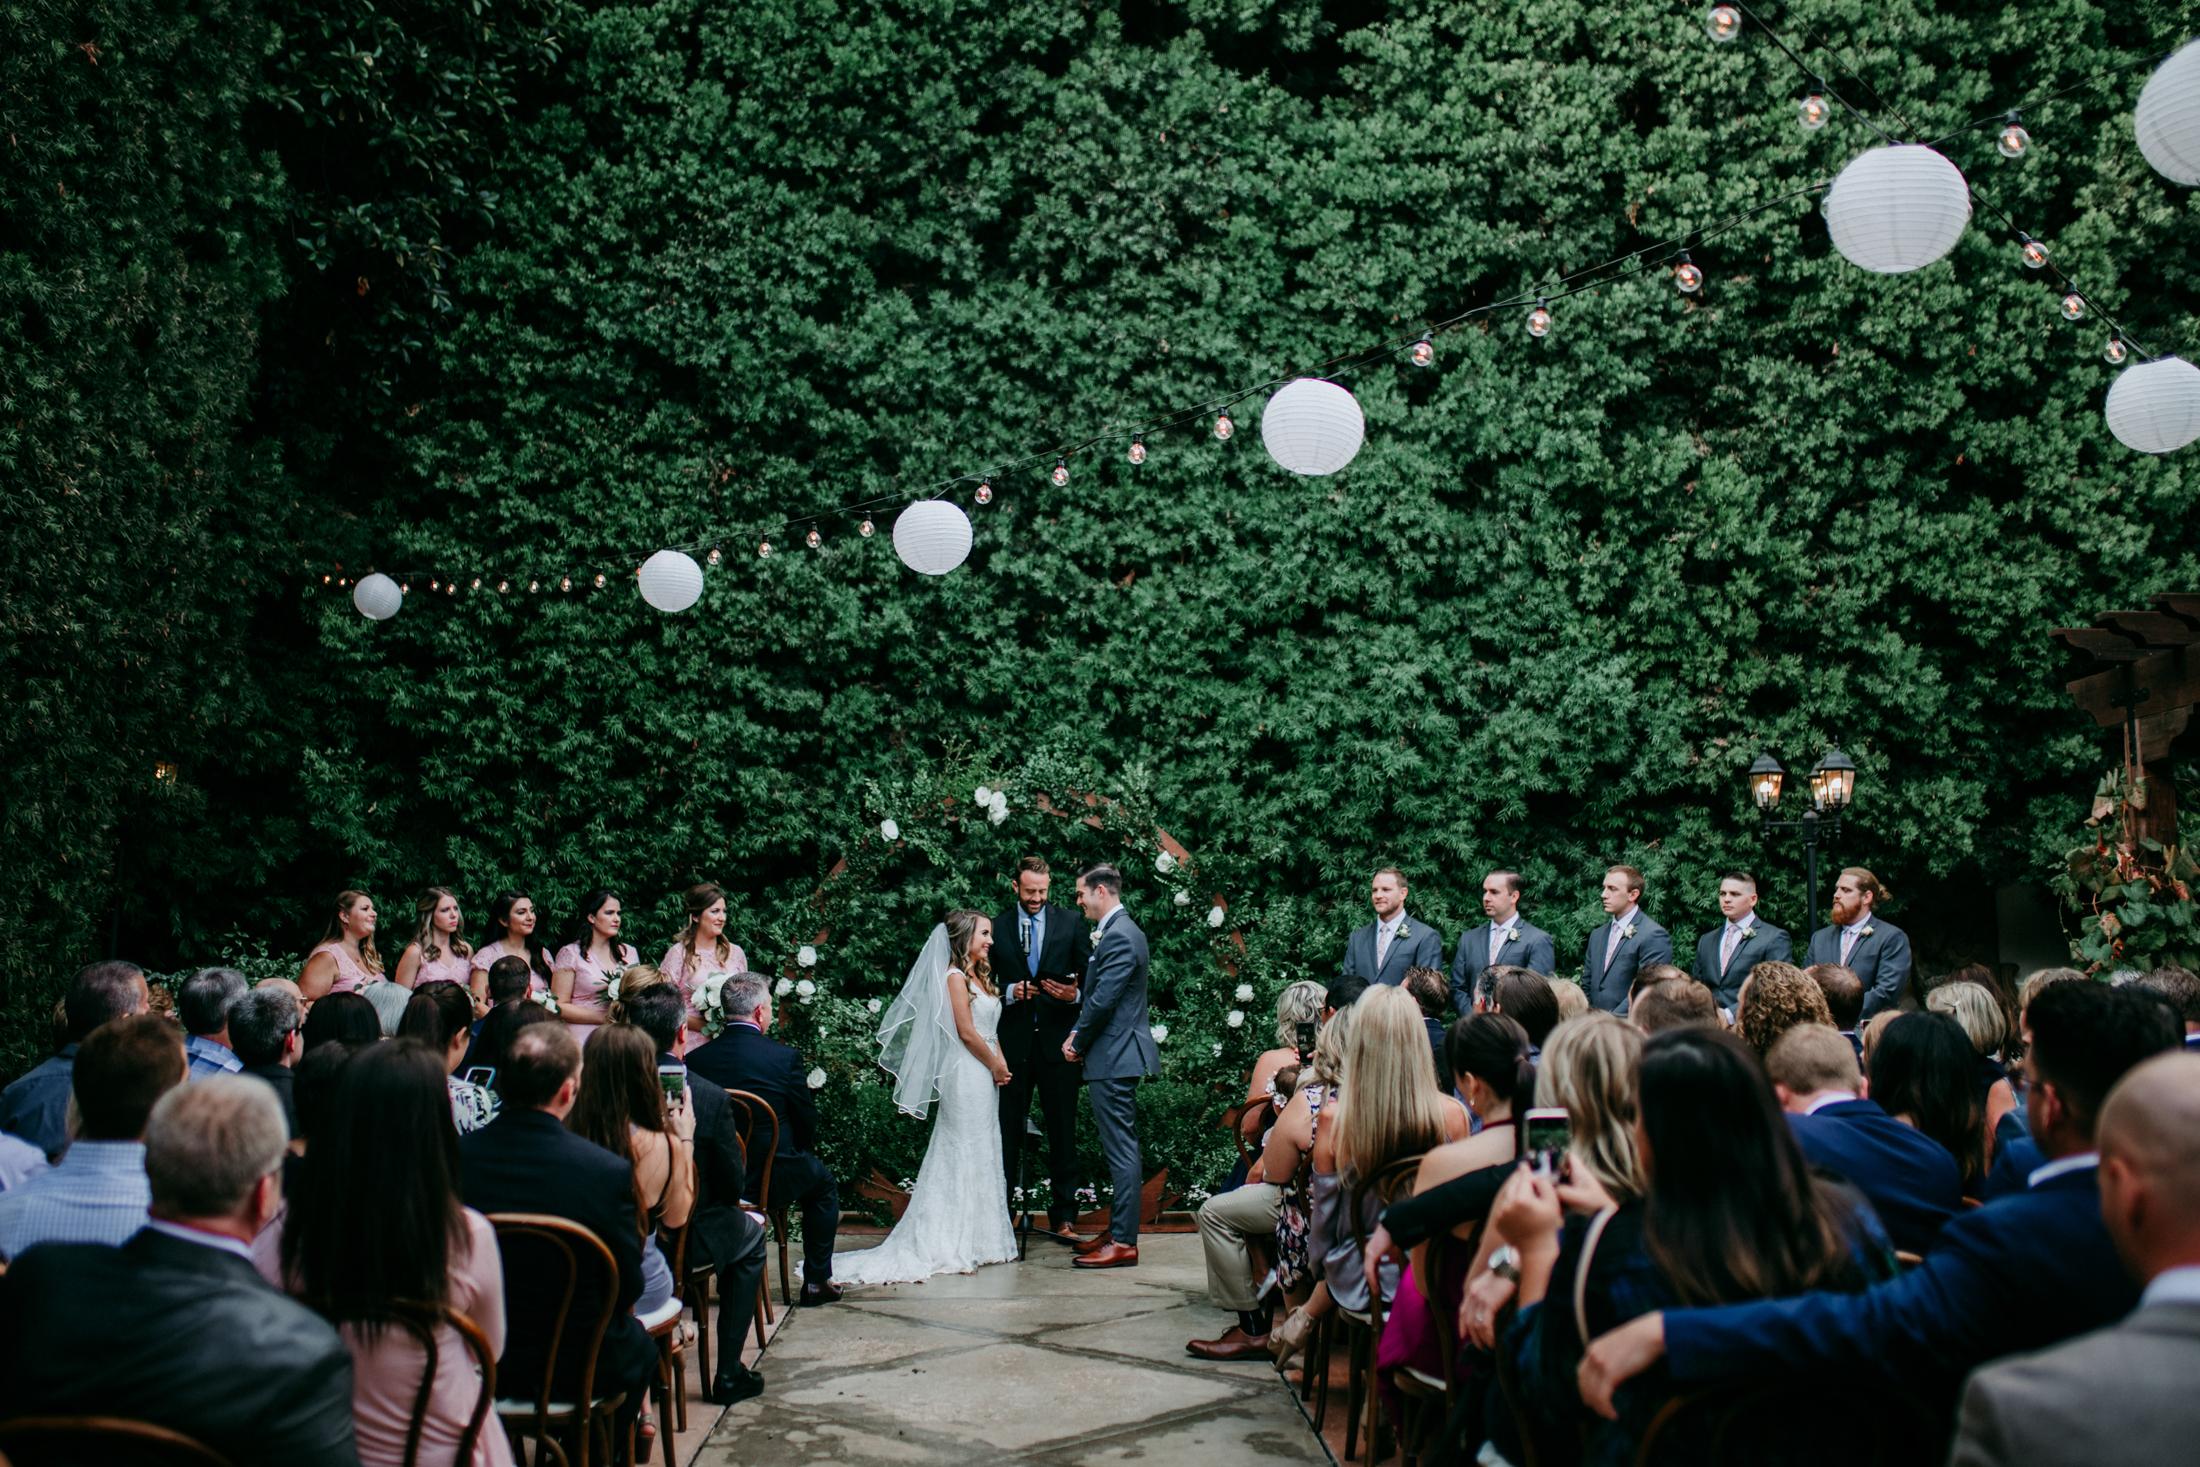 franciscan_garden_wedding-39.jpg